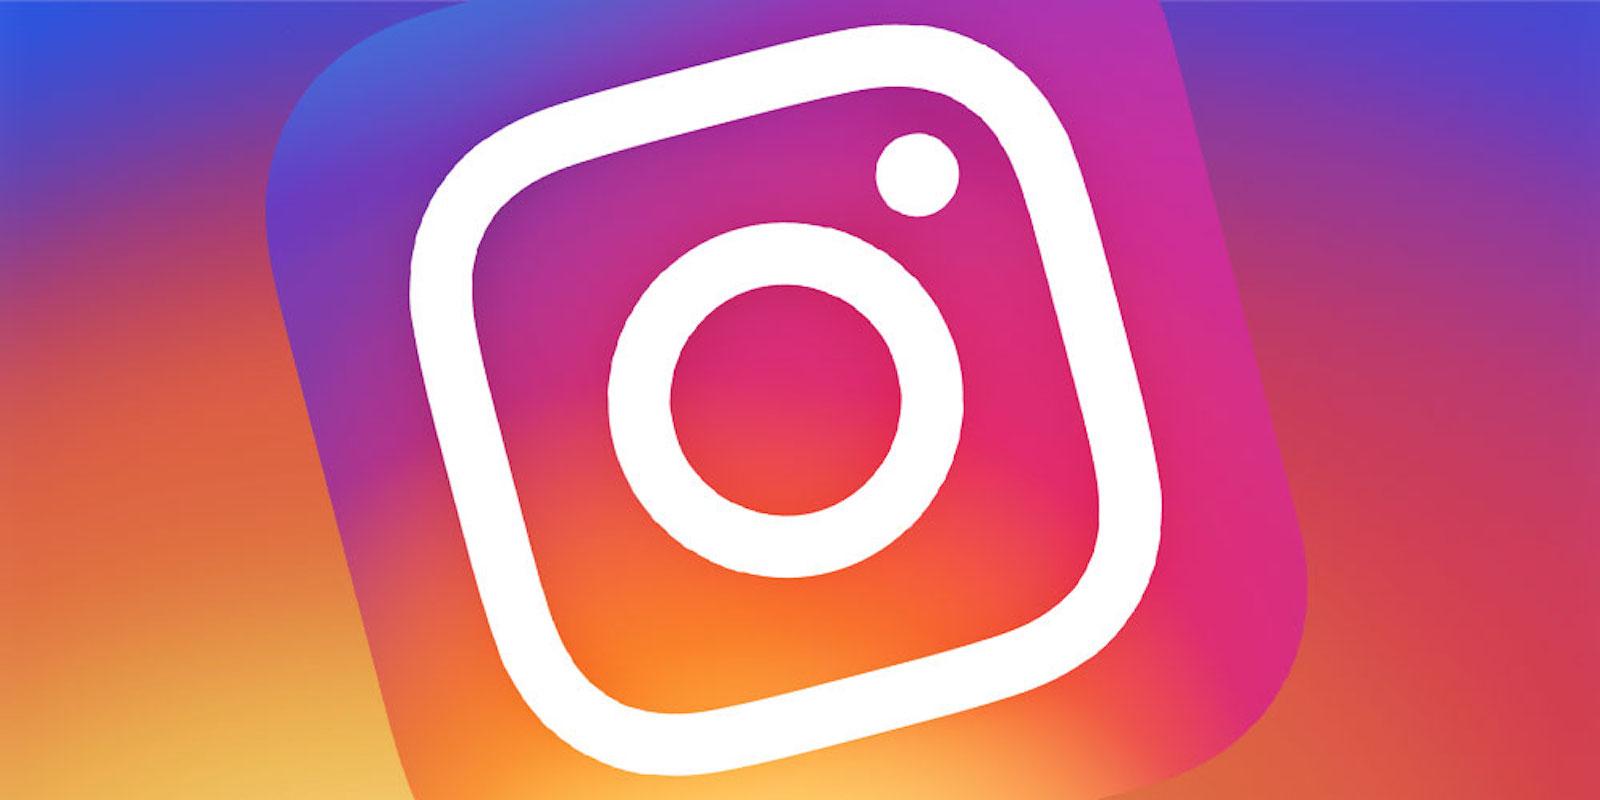 Rhino brings powerful media downloading tools to the Instagram app